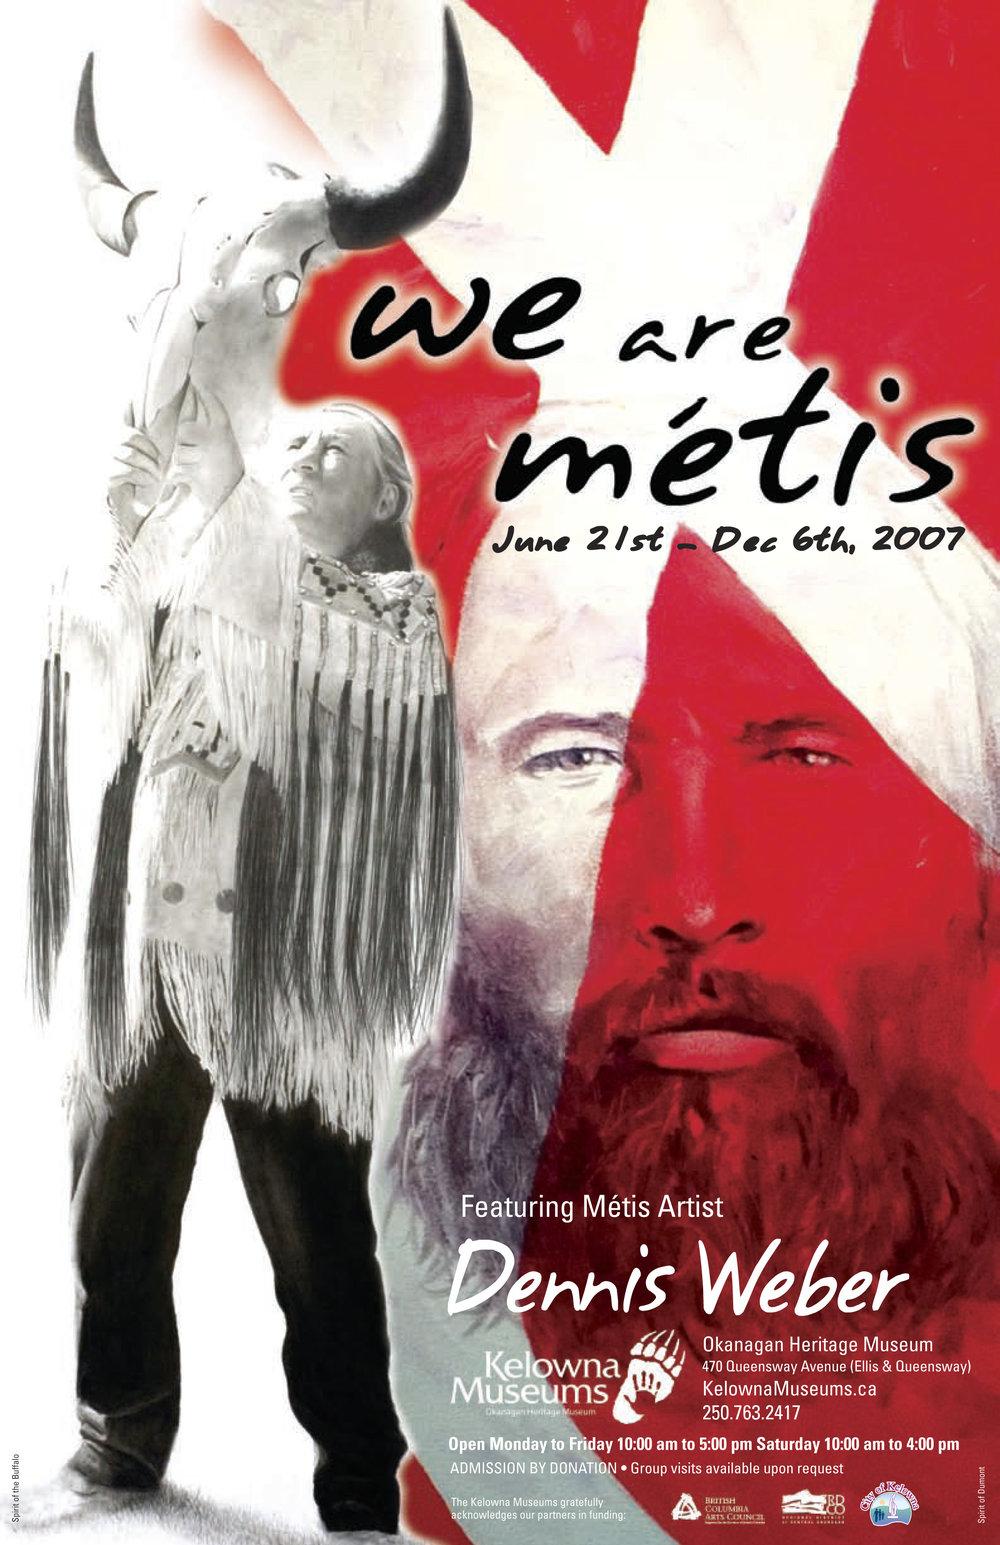 WeAreMetis_Poster.jpg